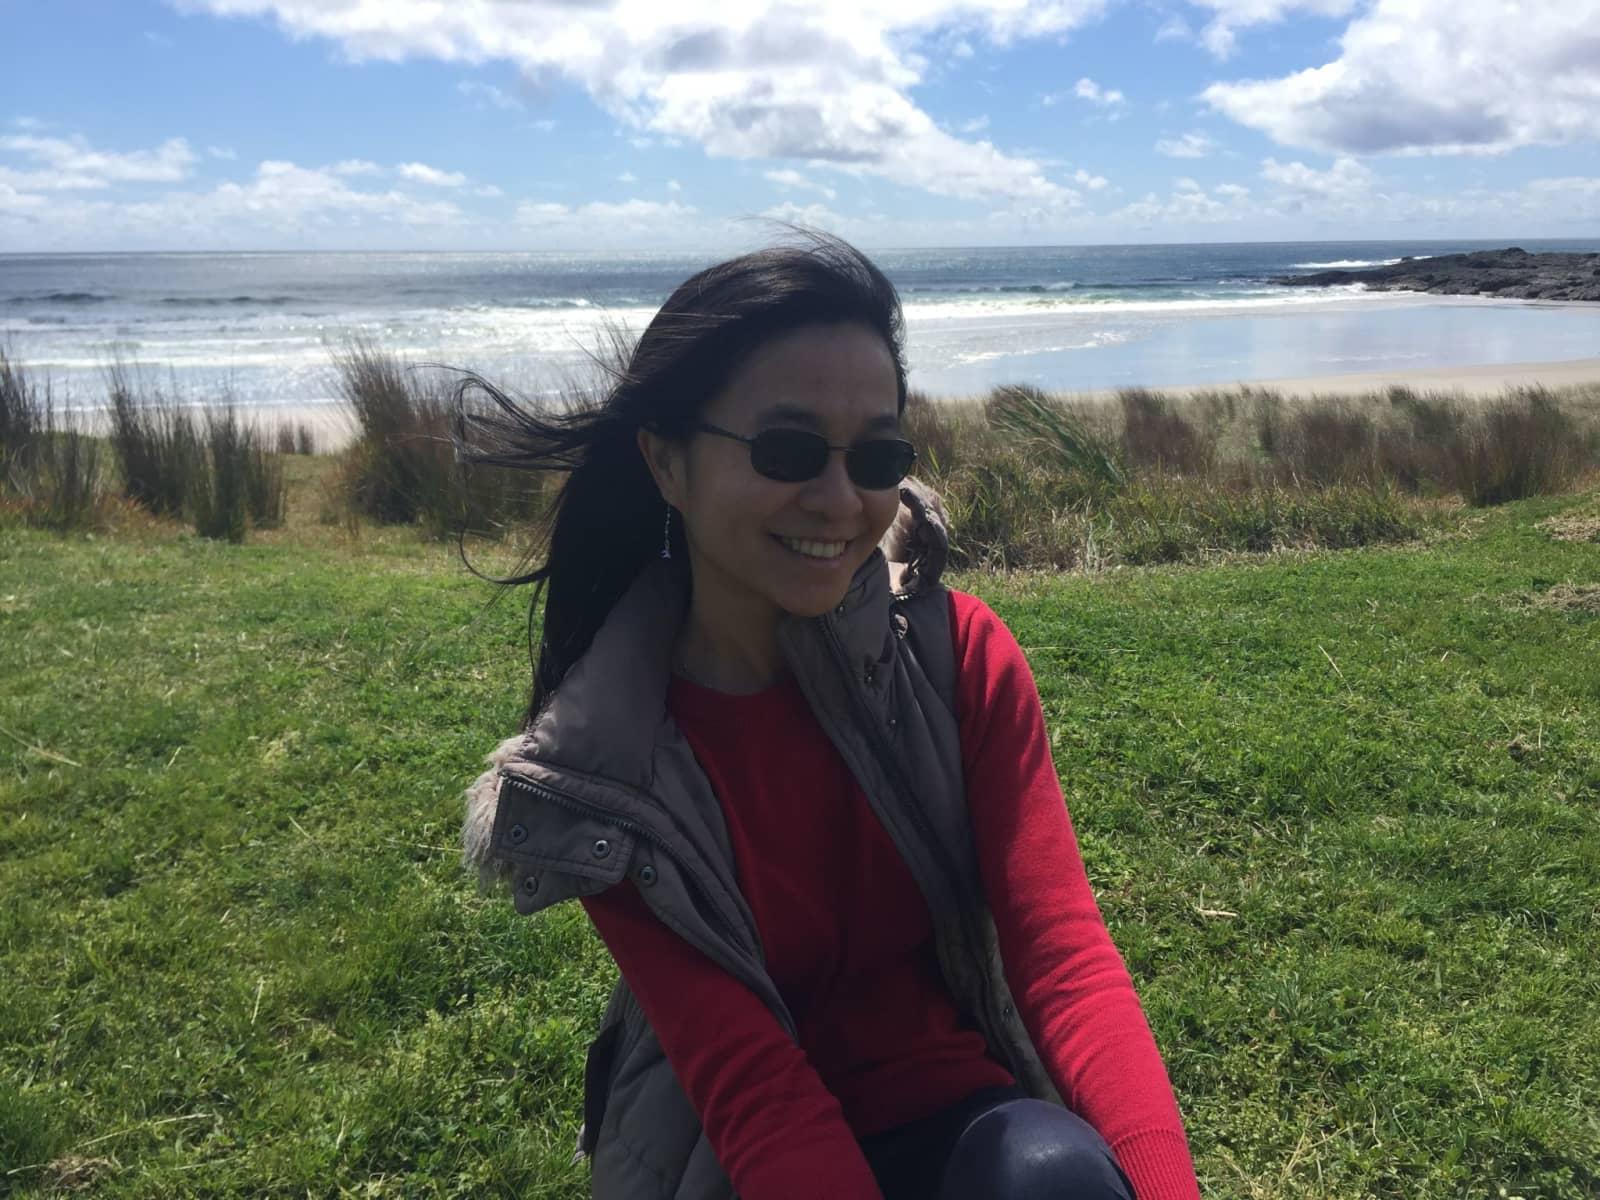 Kn from Wellington, New Zealand